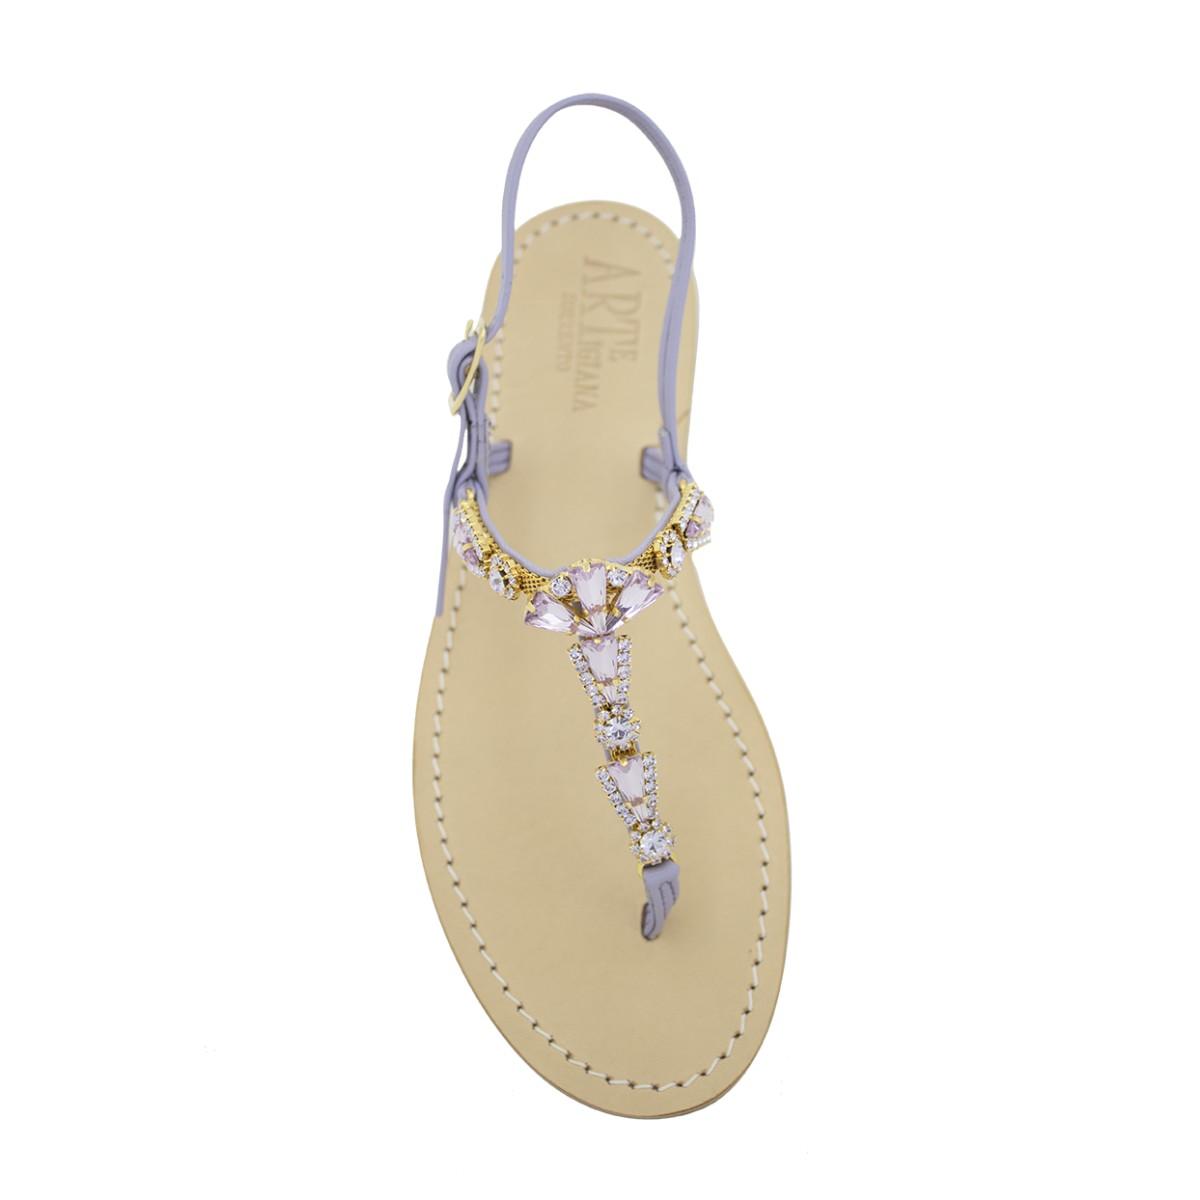 Moda Gioiello SorrentoCapriPositano Moda Artigianali Sandali